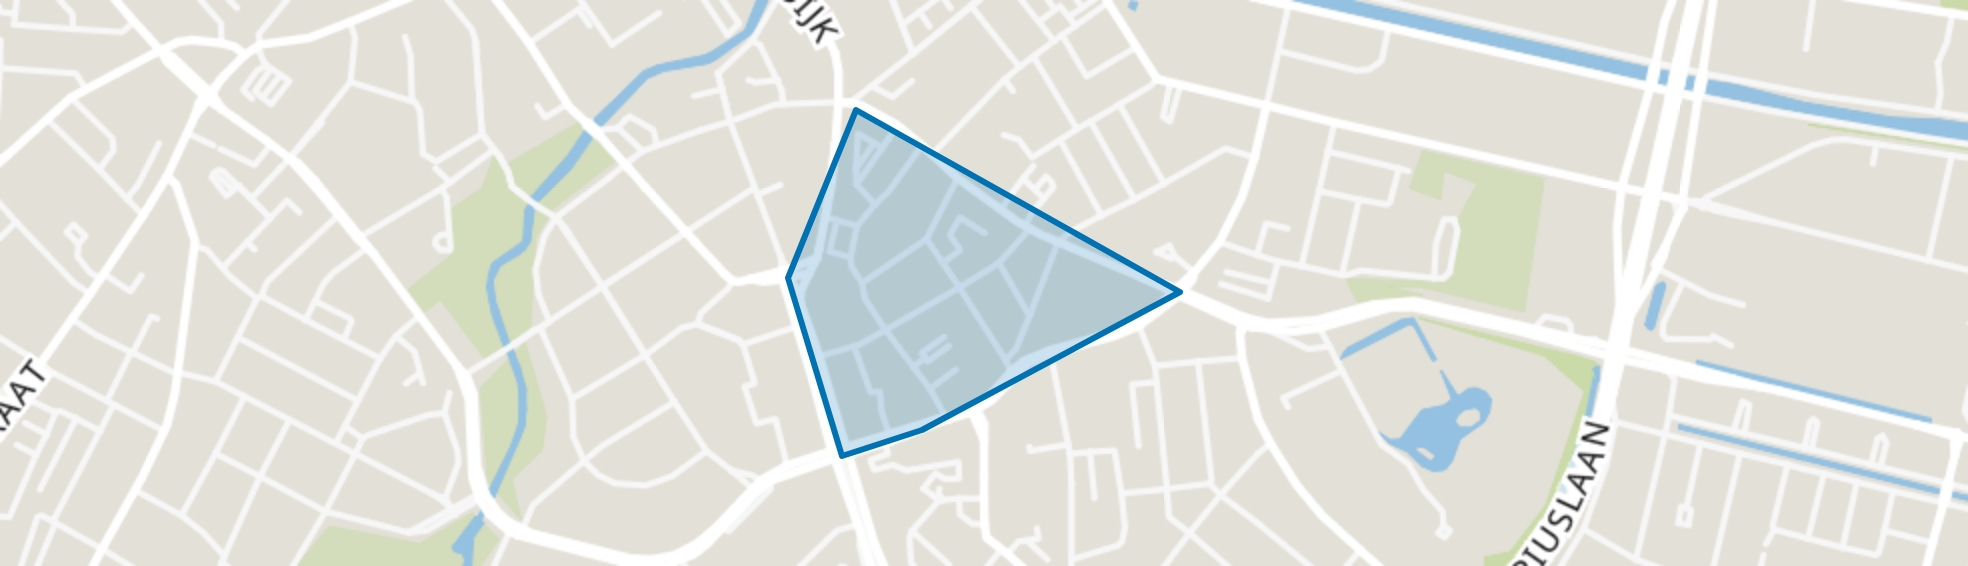 Rochusbuurt, Eindhoven map